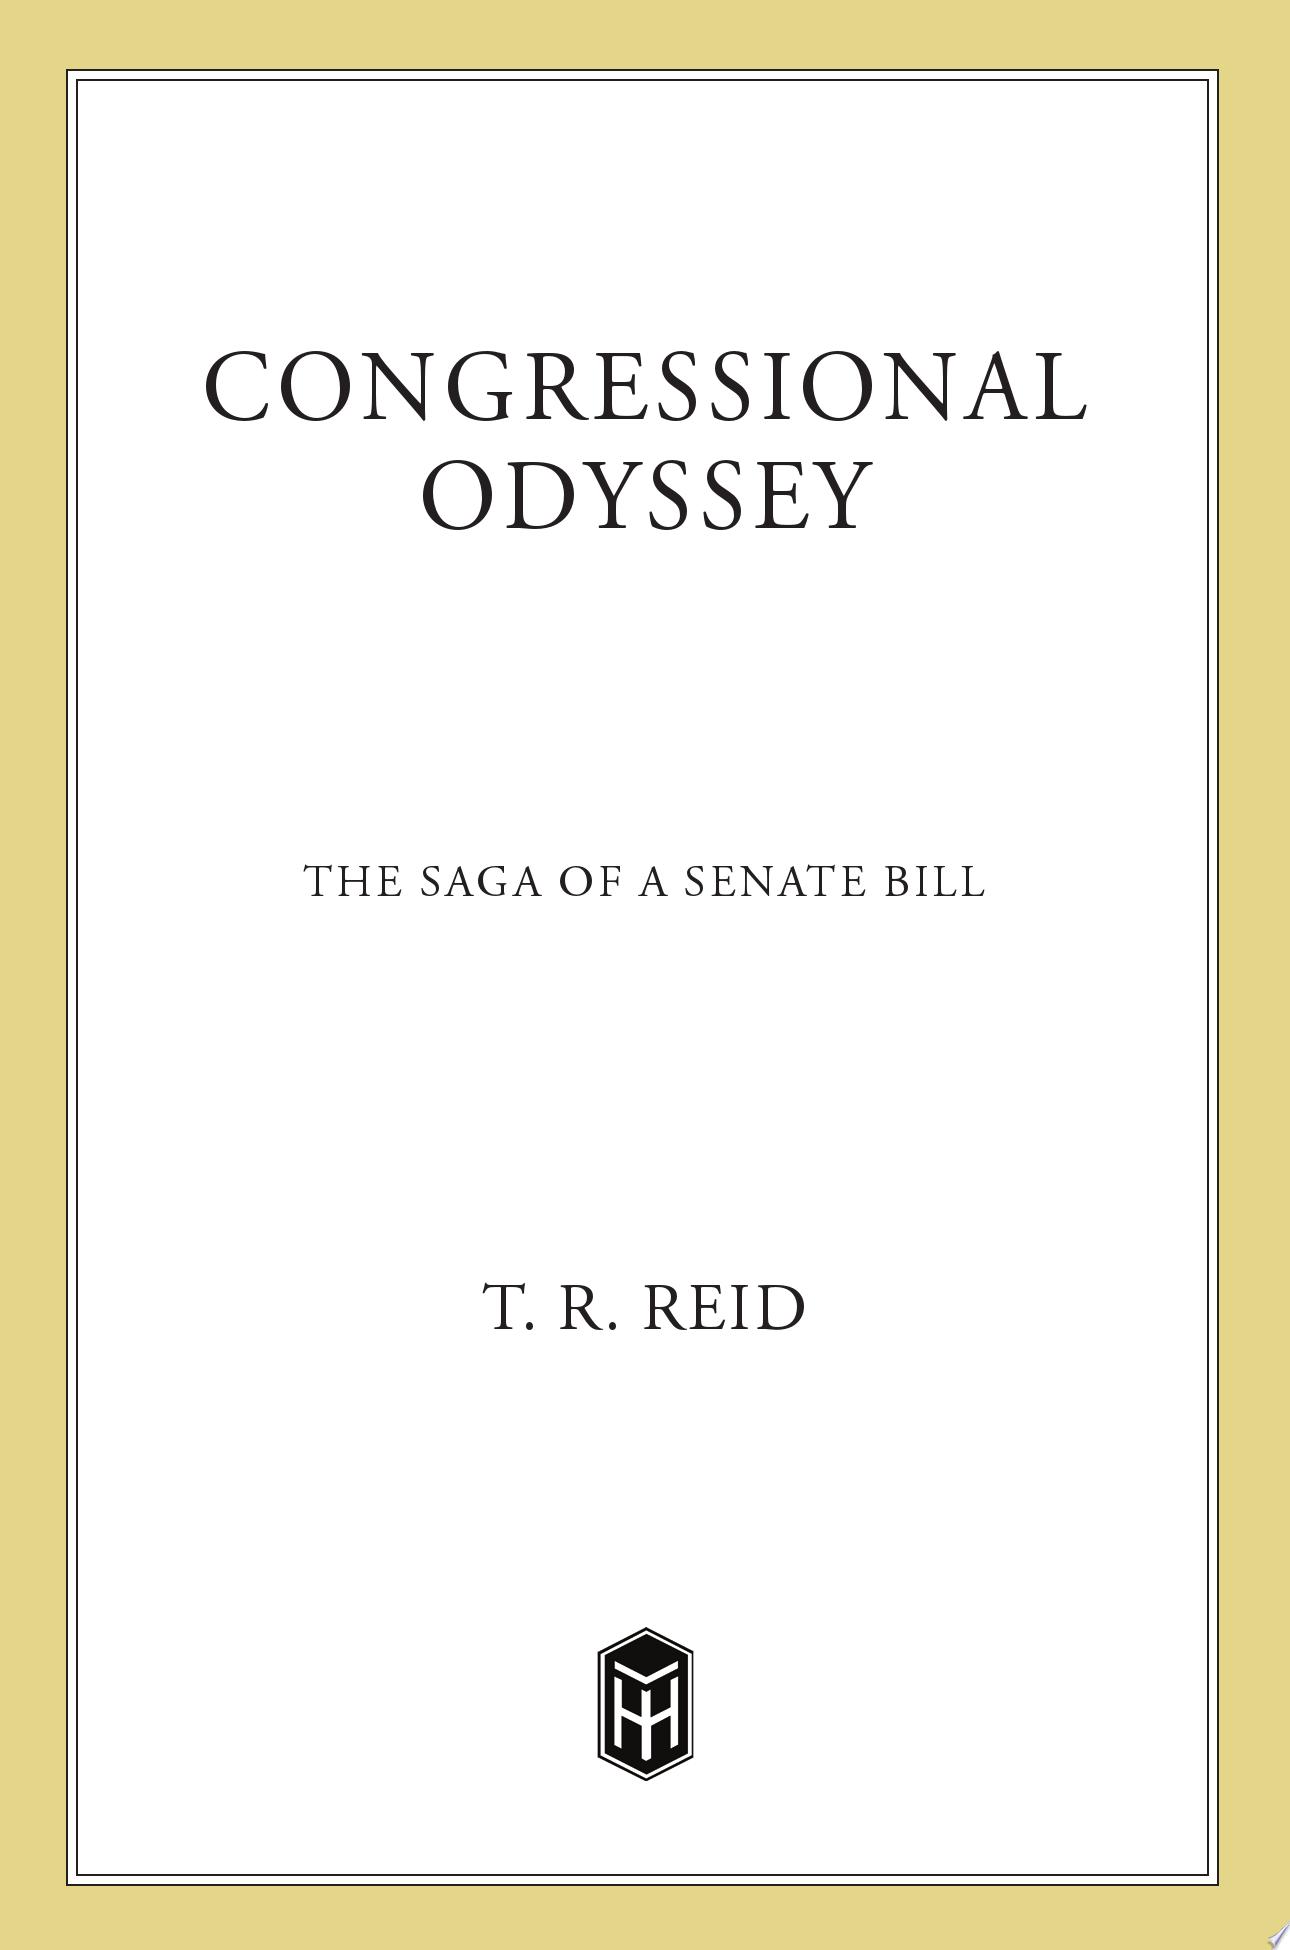 Congressional Odyssey